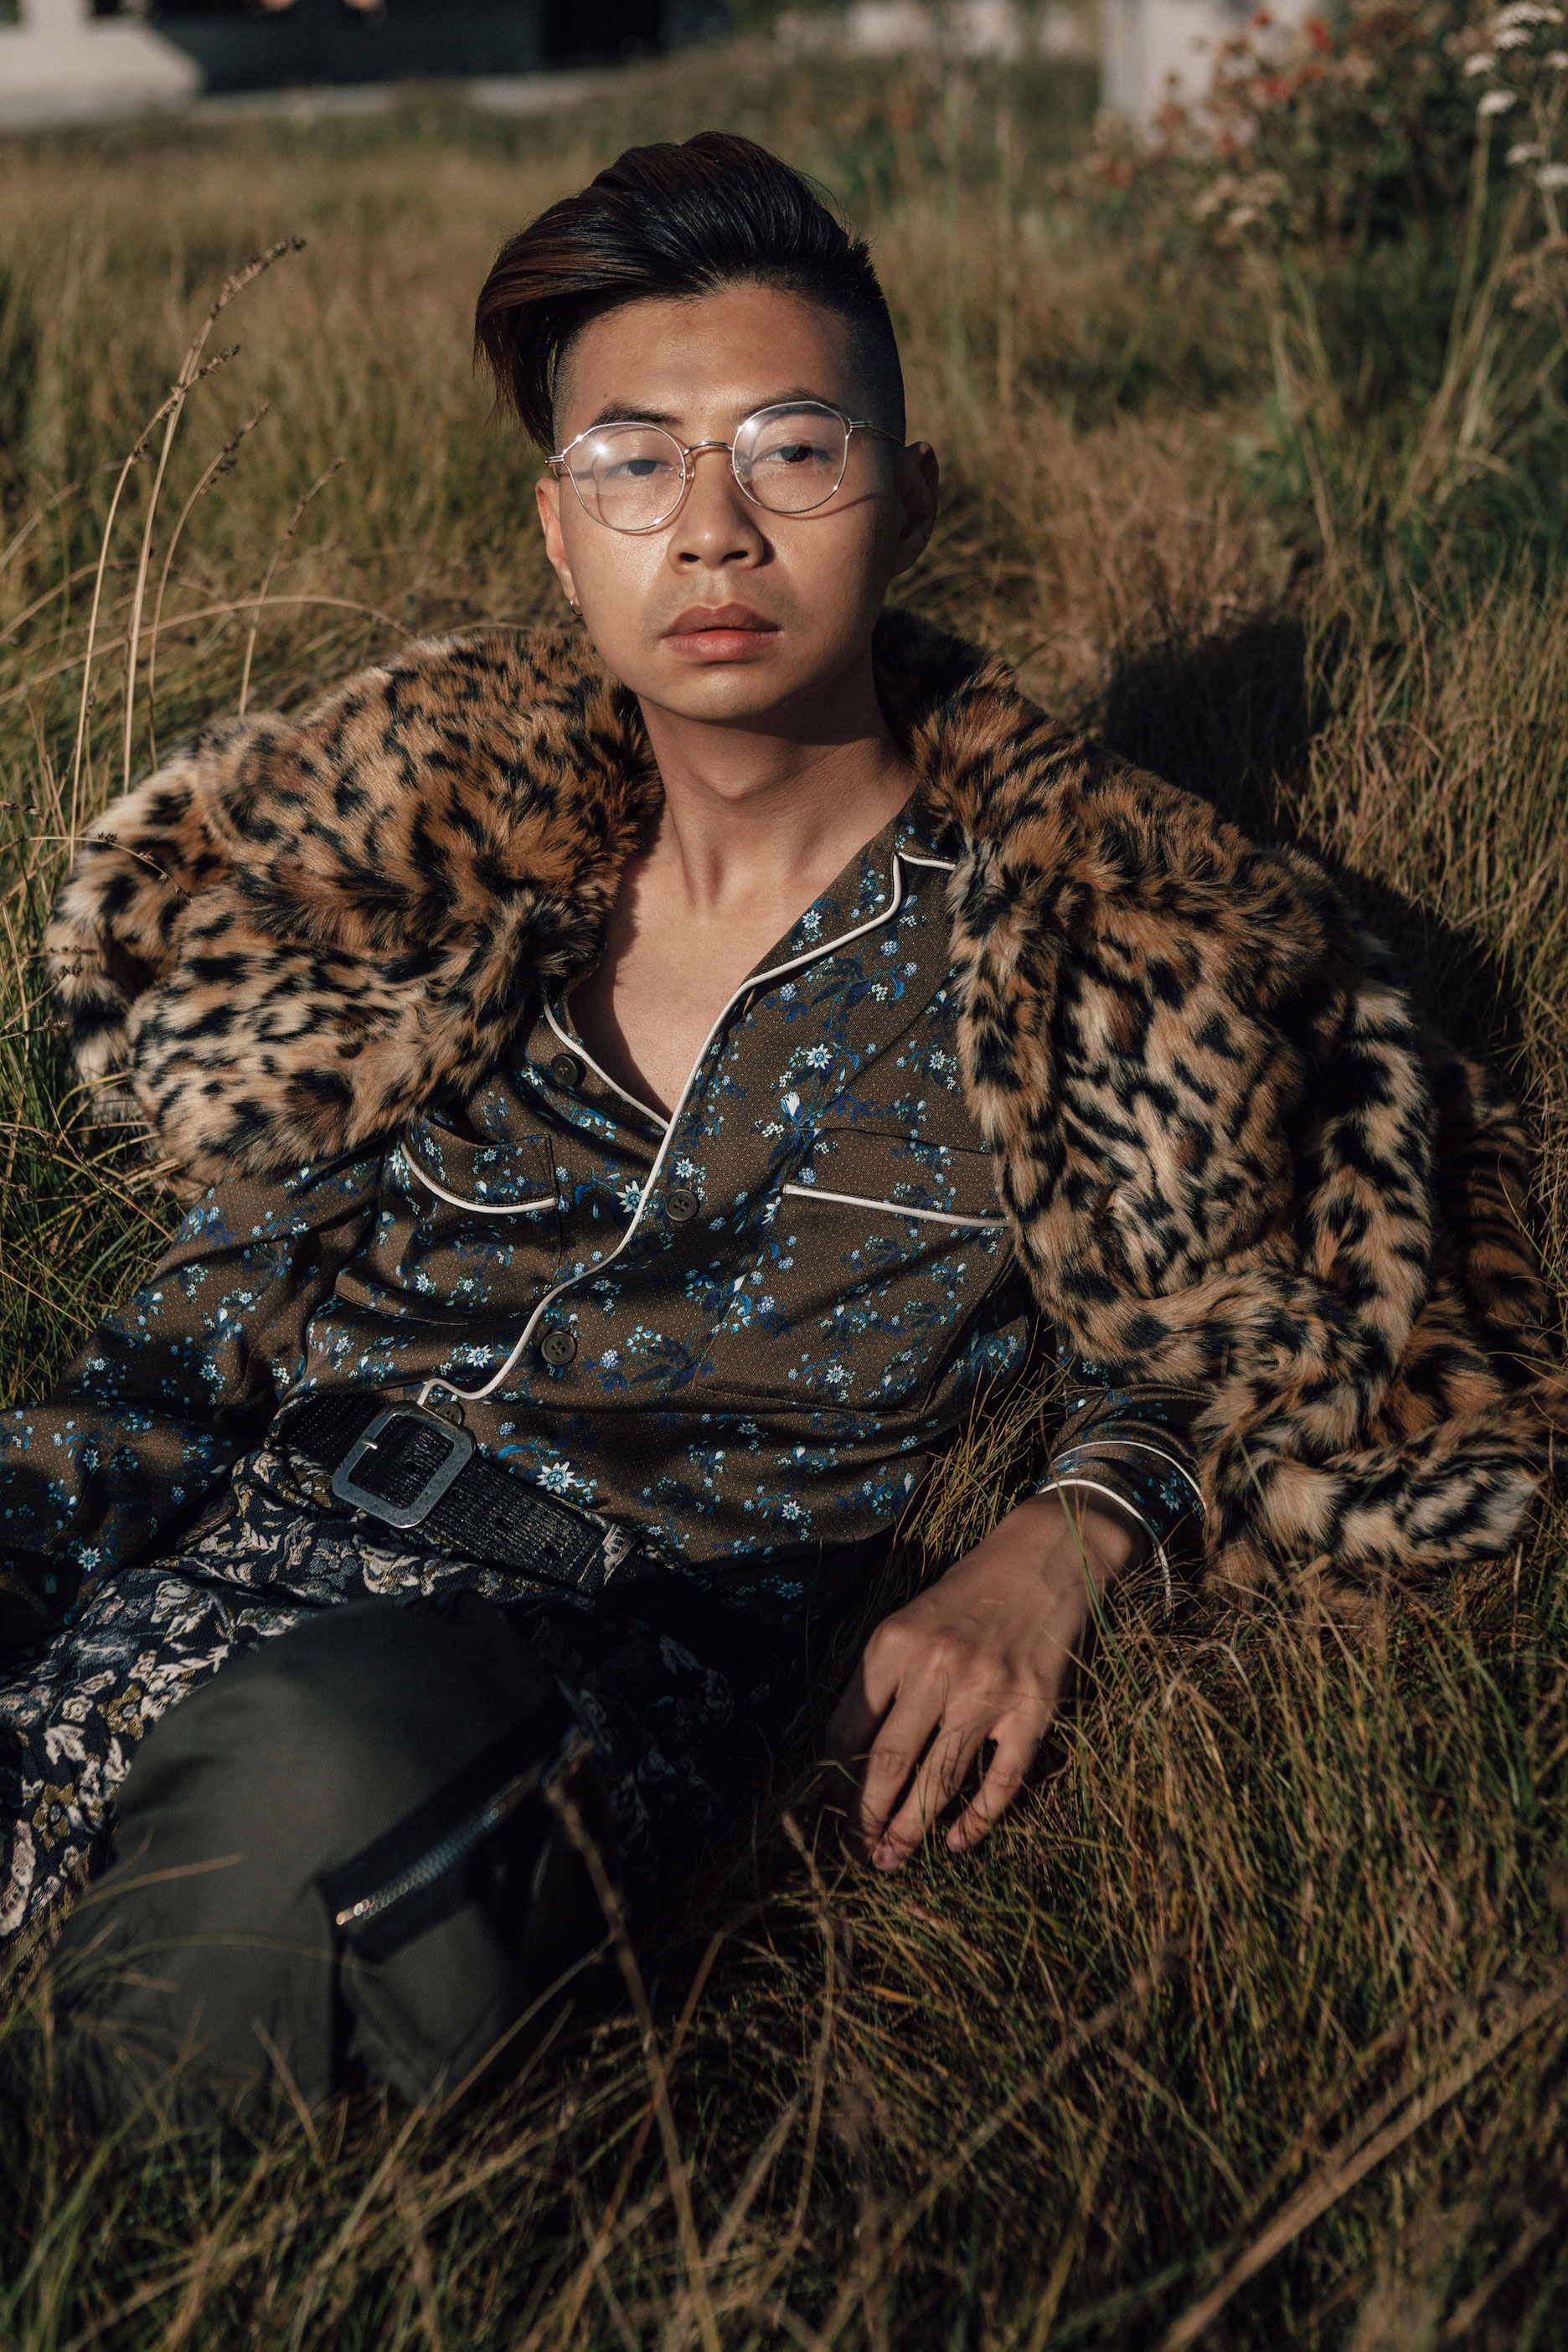 mybelonging-tommylei-top-menswear-blogger-erdem-x-hm-streetstyle-azusa-takano-photography63.jpg